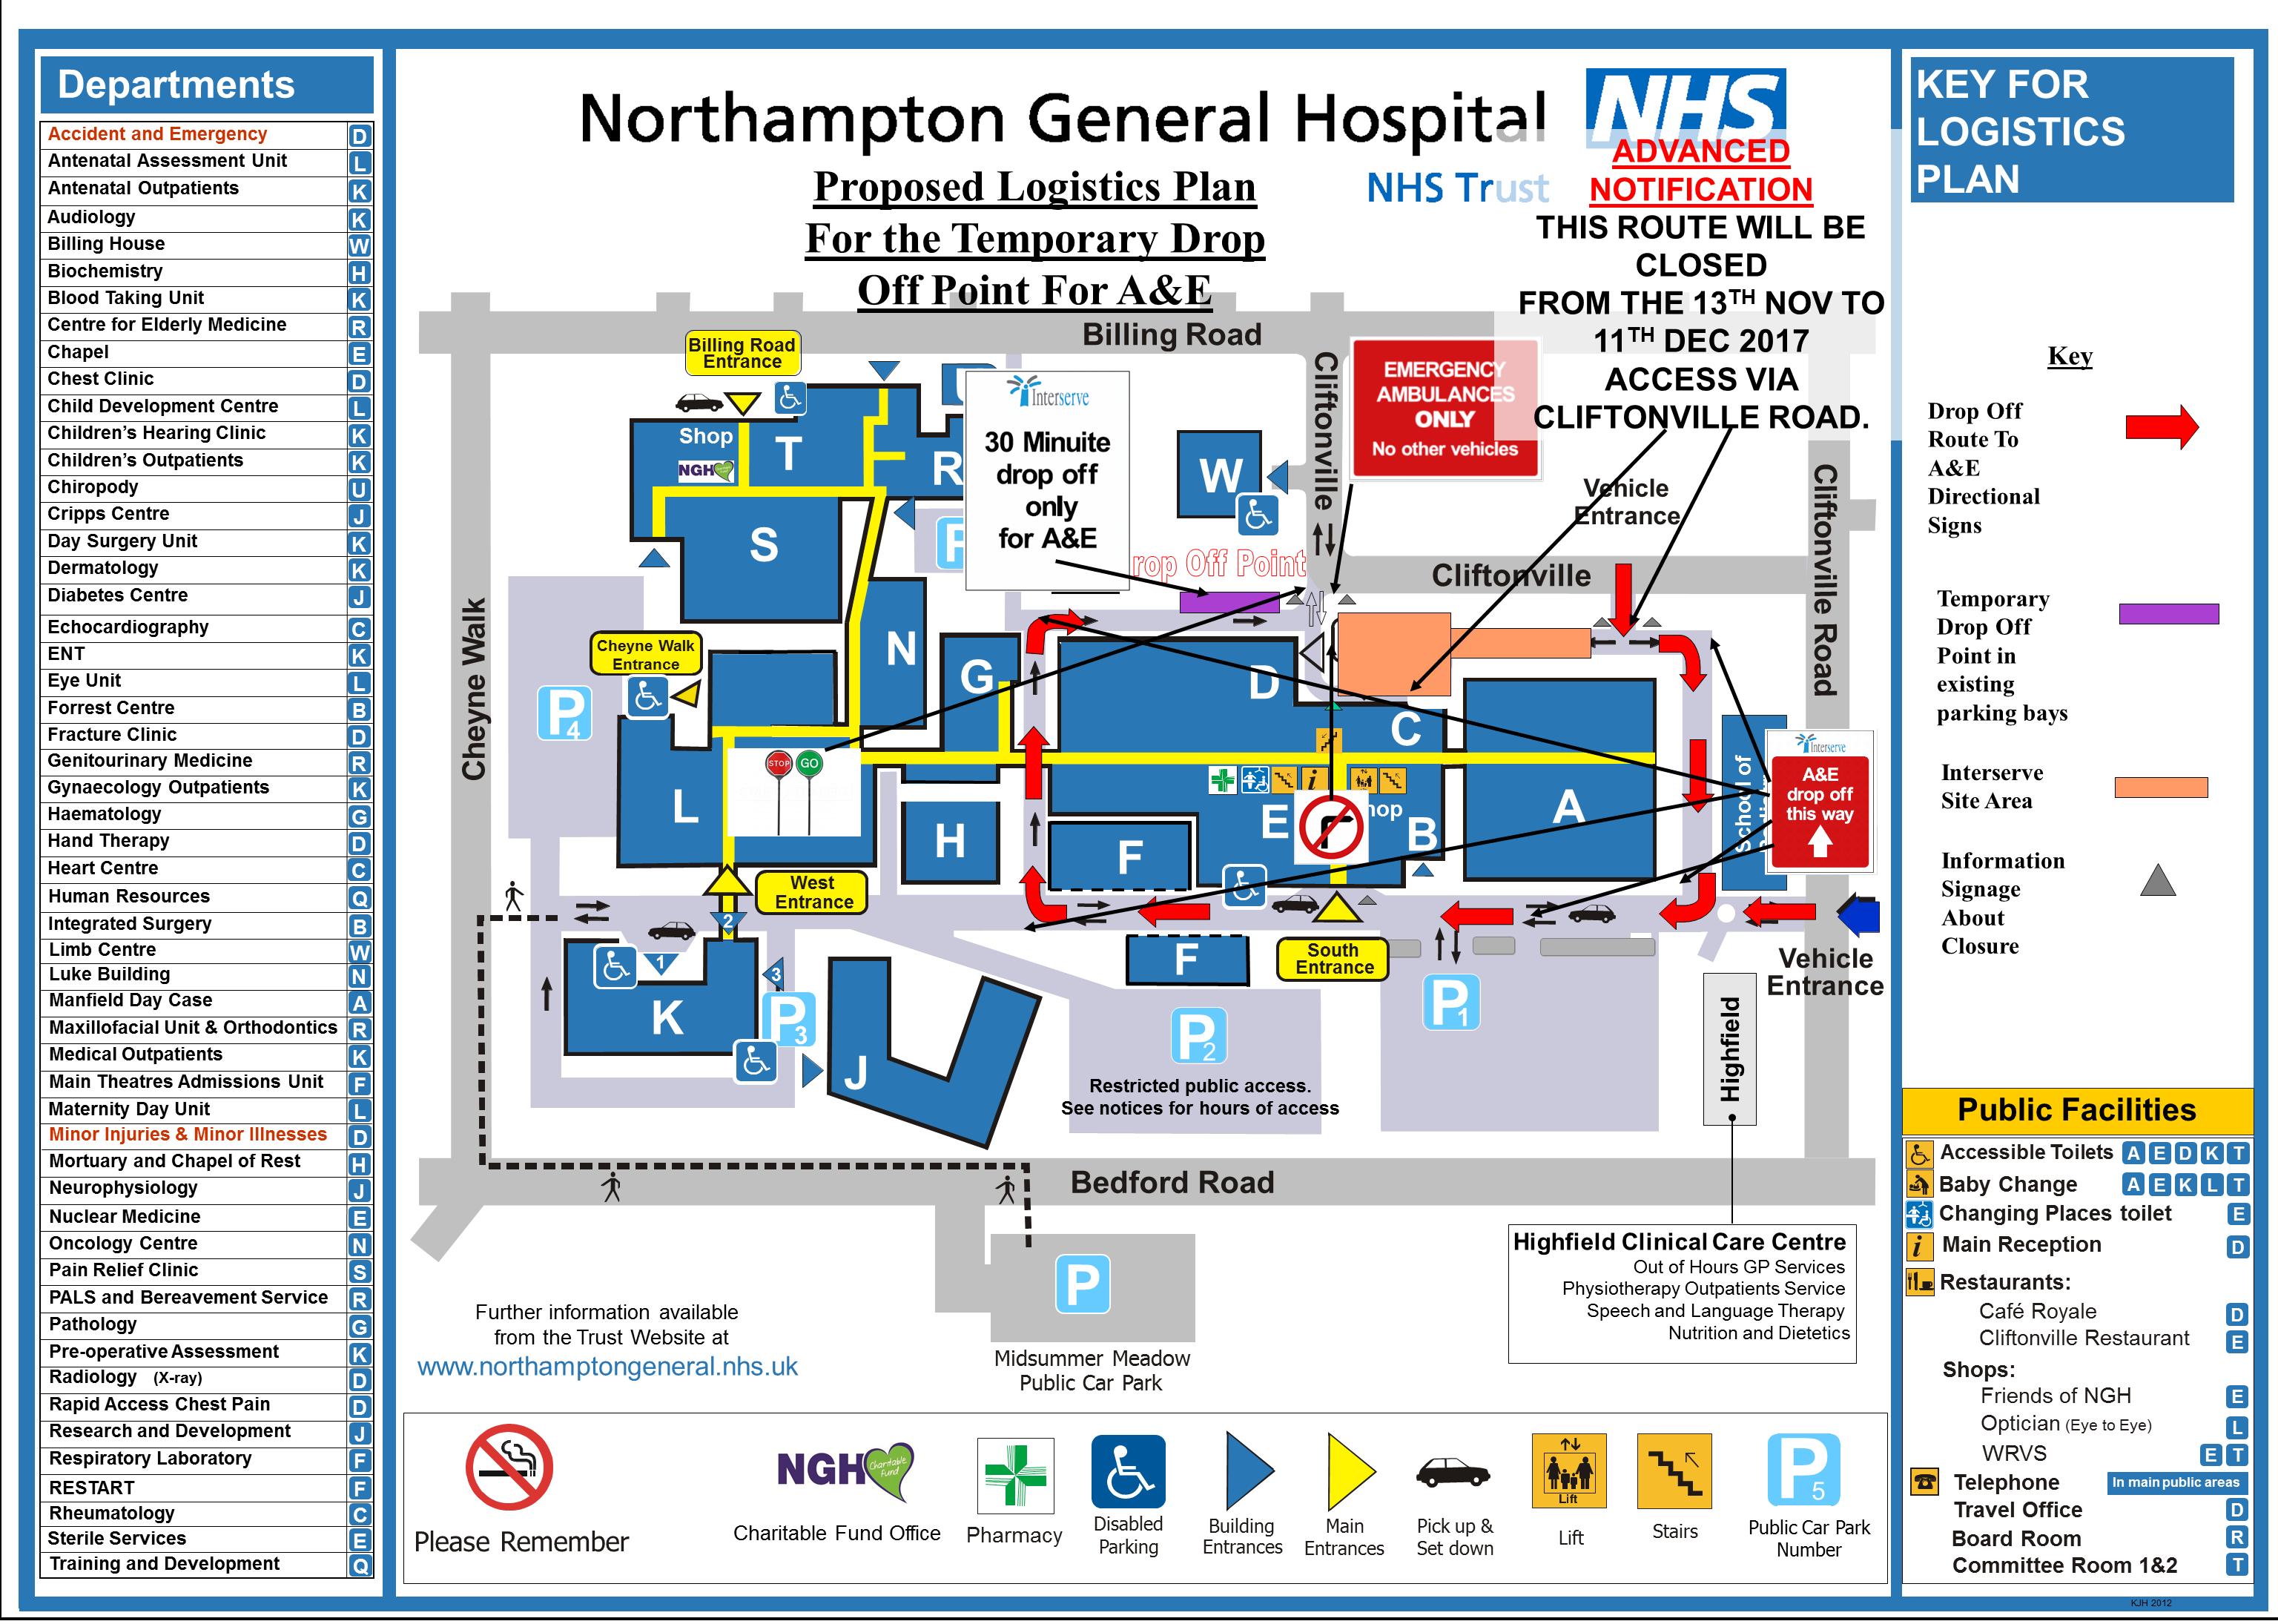 Northampton General Hospital Map Major Building and Service Improvements Northampton General Hospital Map